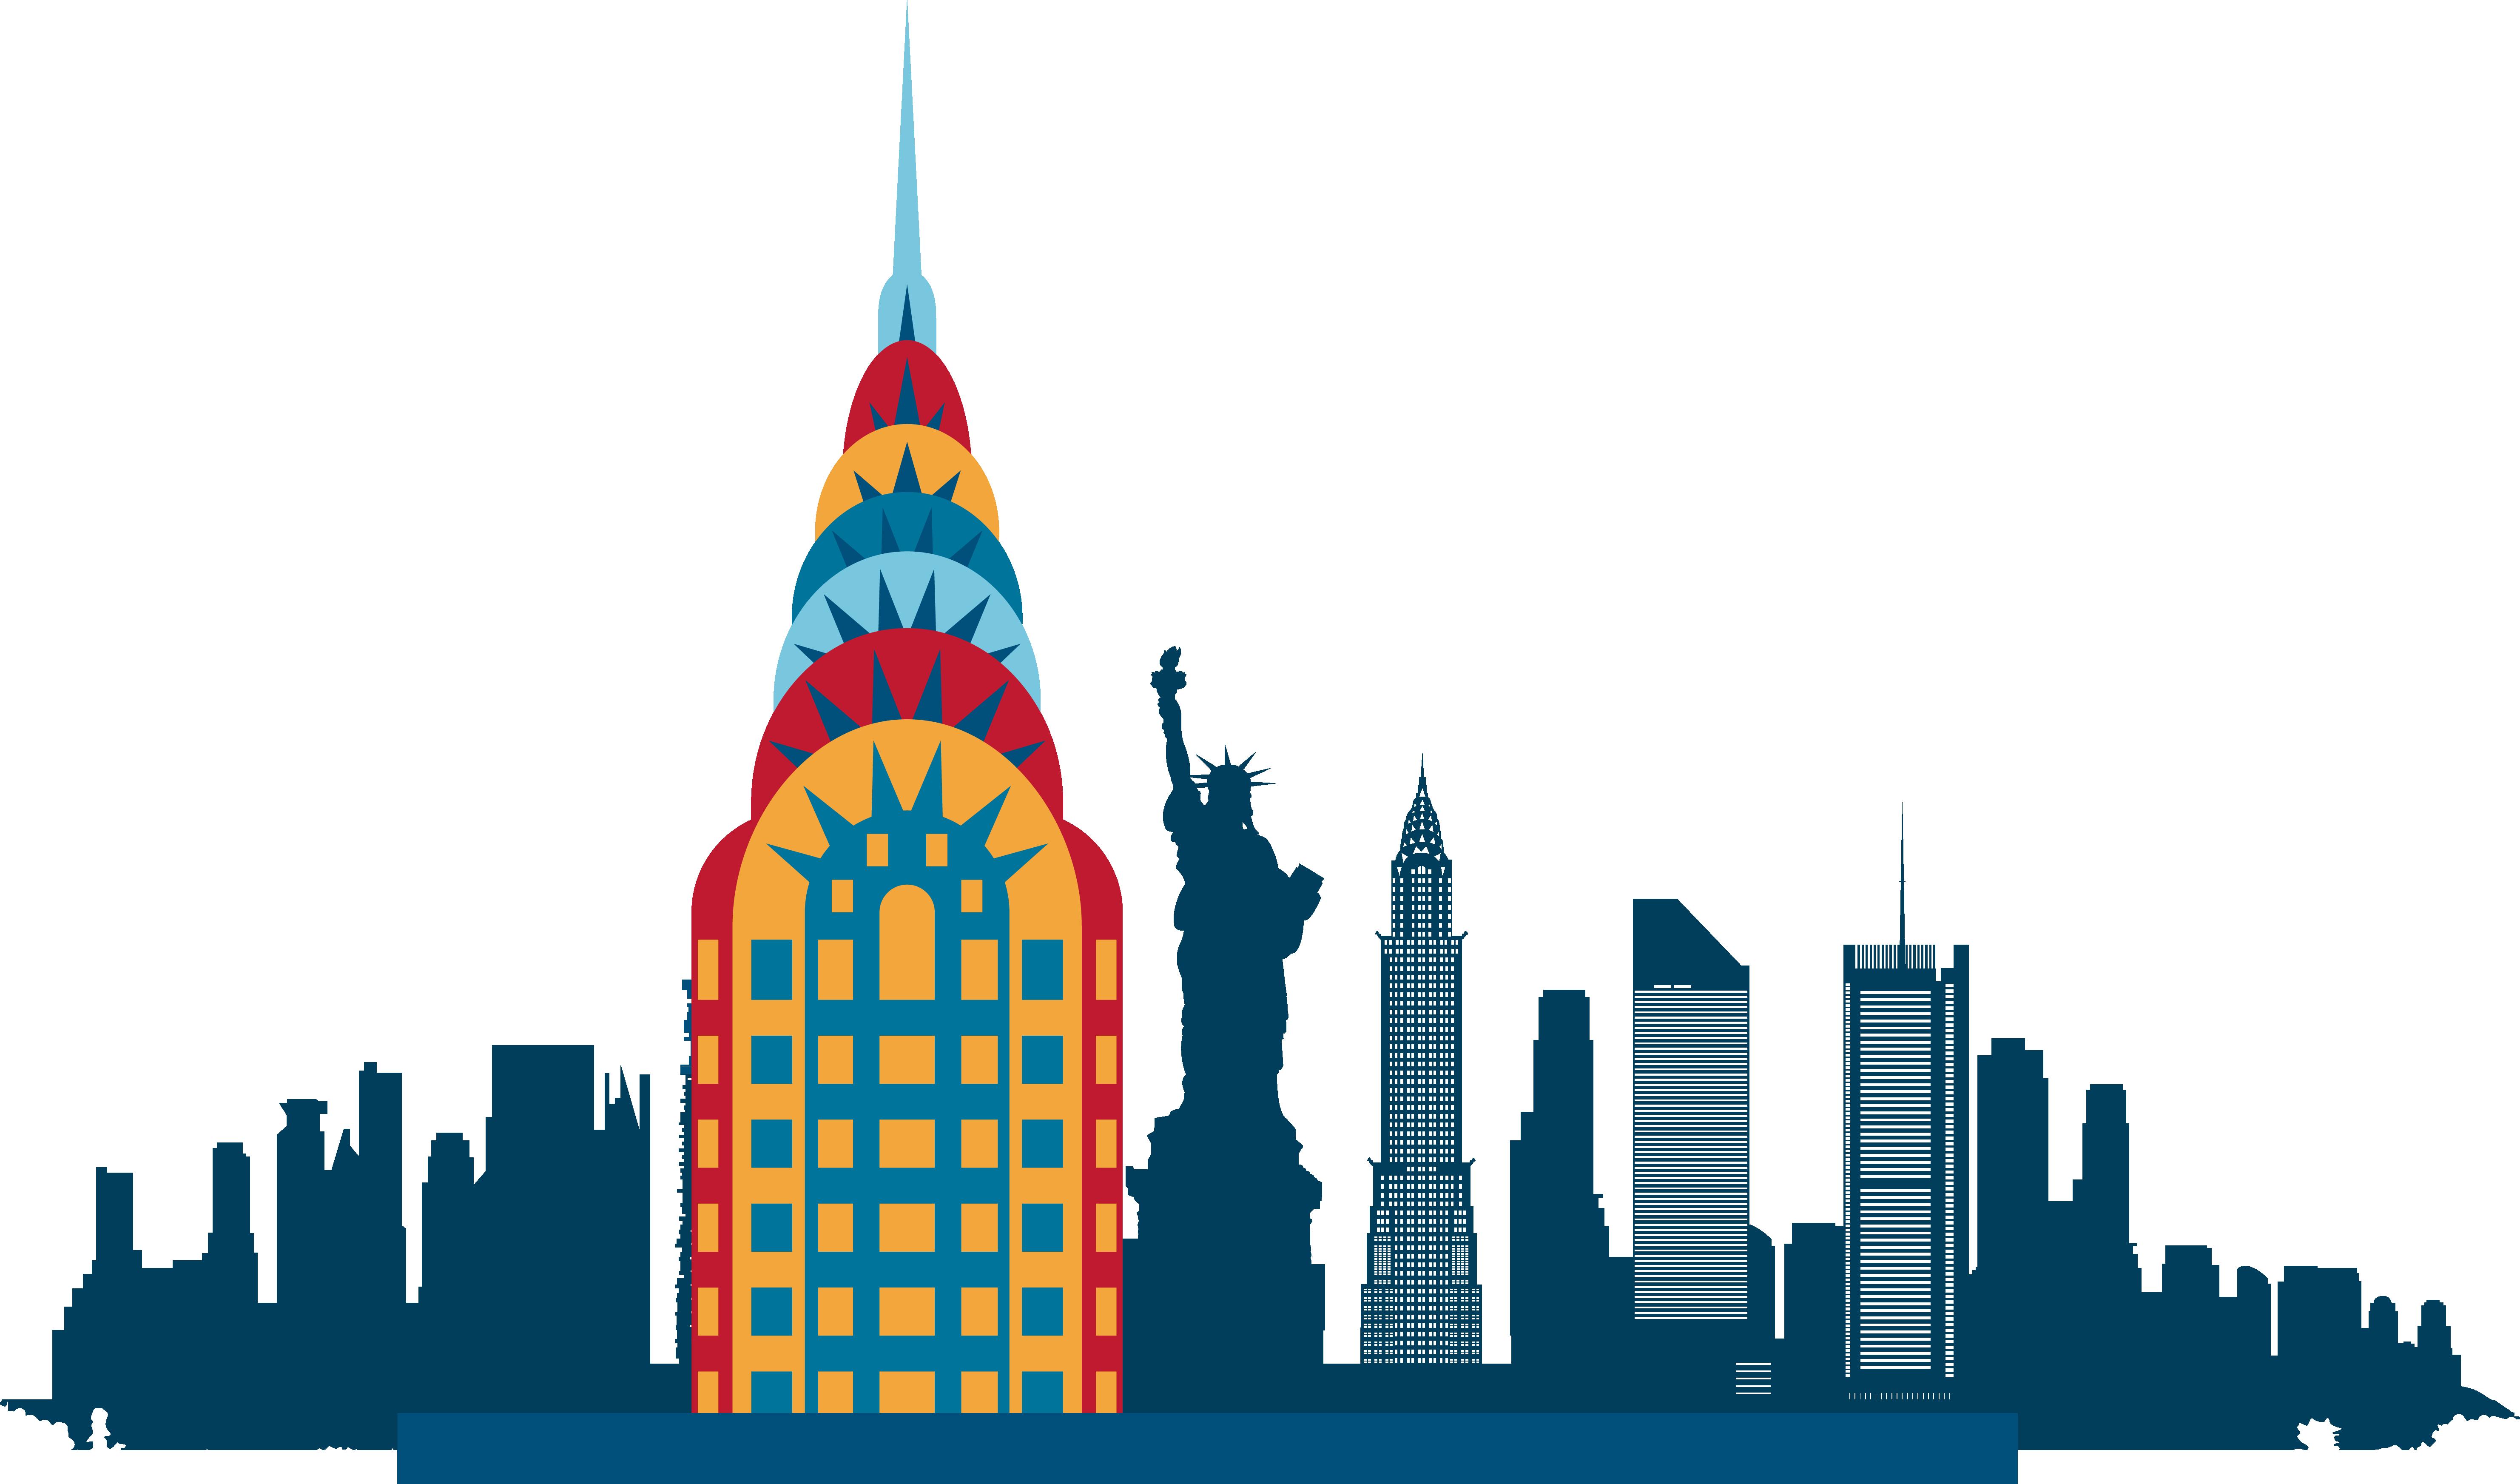 Statue Of Liberty Png New York City And Statue Of Liberty Usa Symbol Free Transparent Png Logos